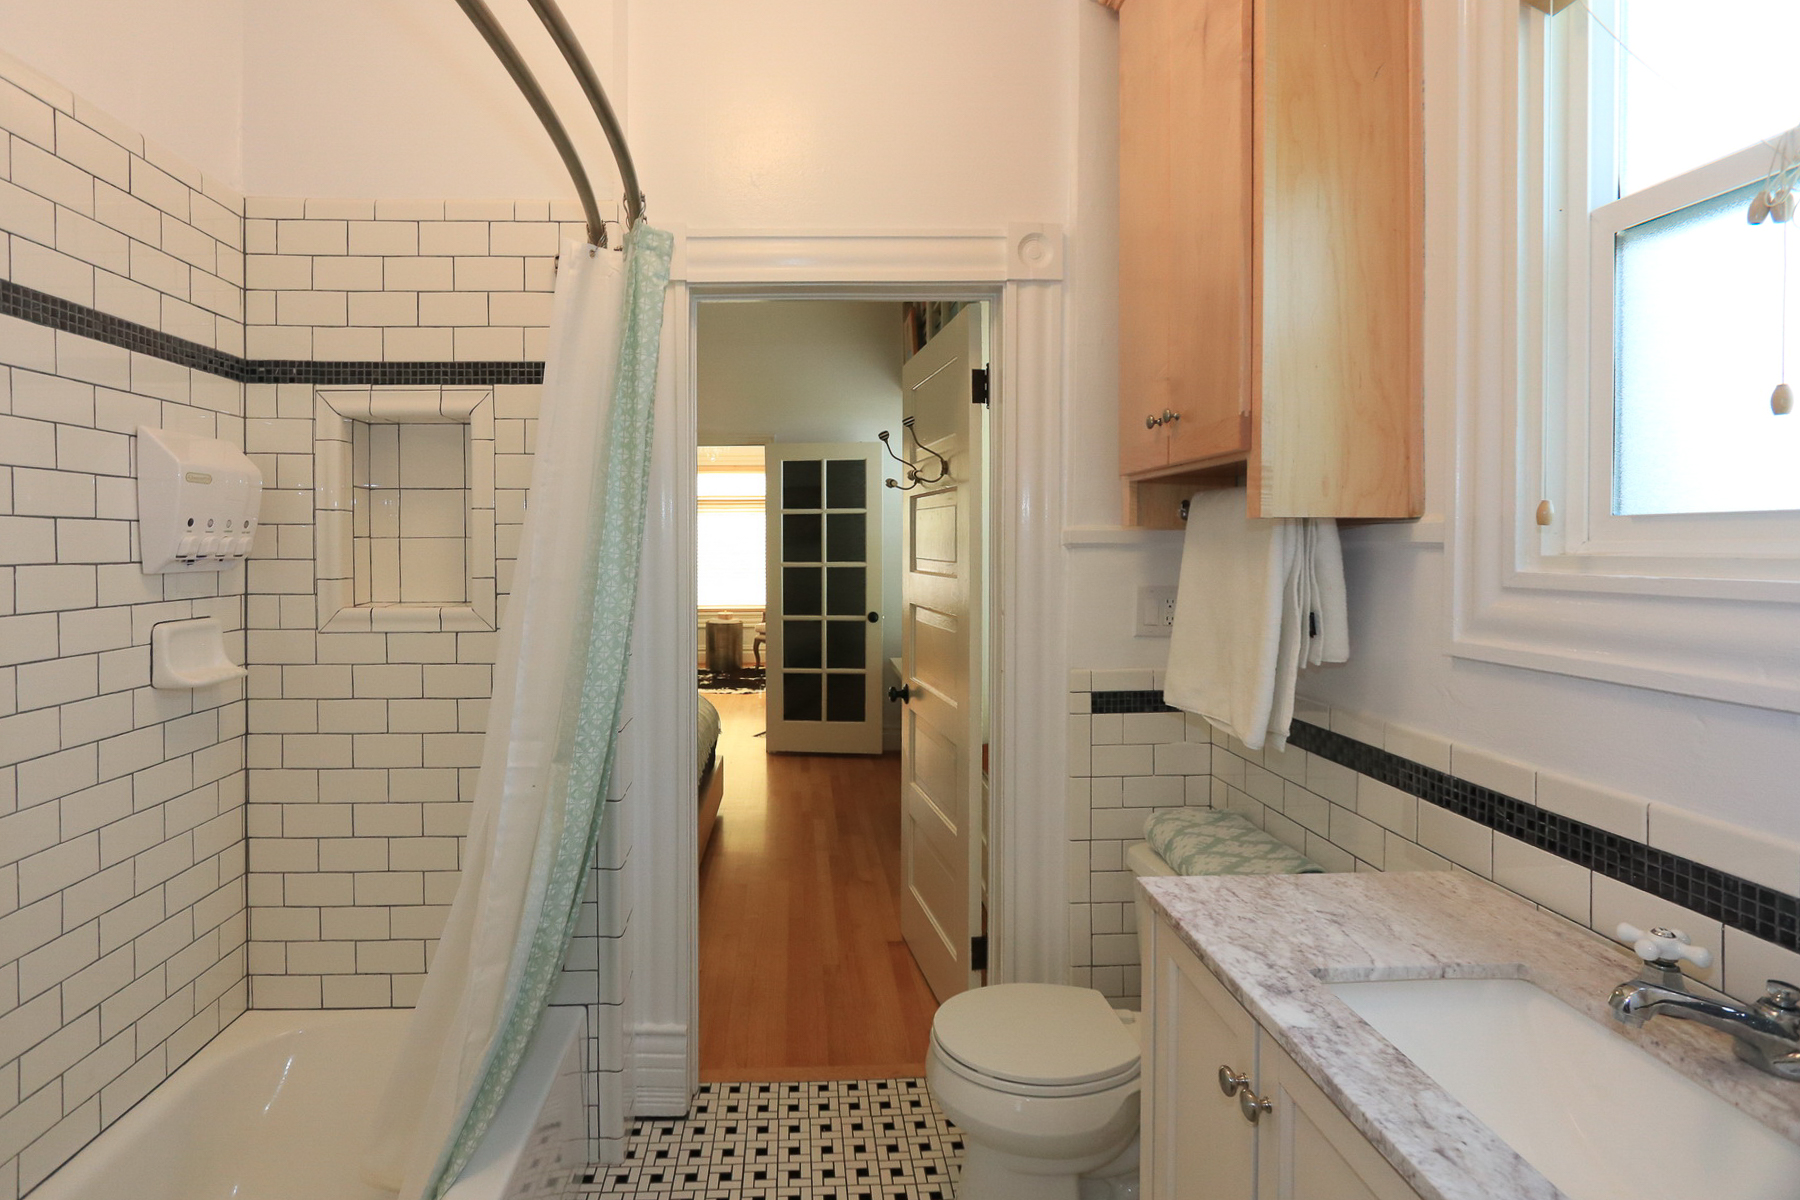 Bathroom of 270 J St Salt Lake City, UT 84103